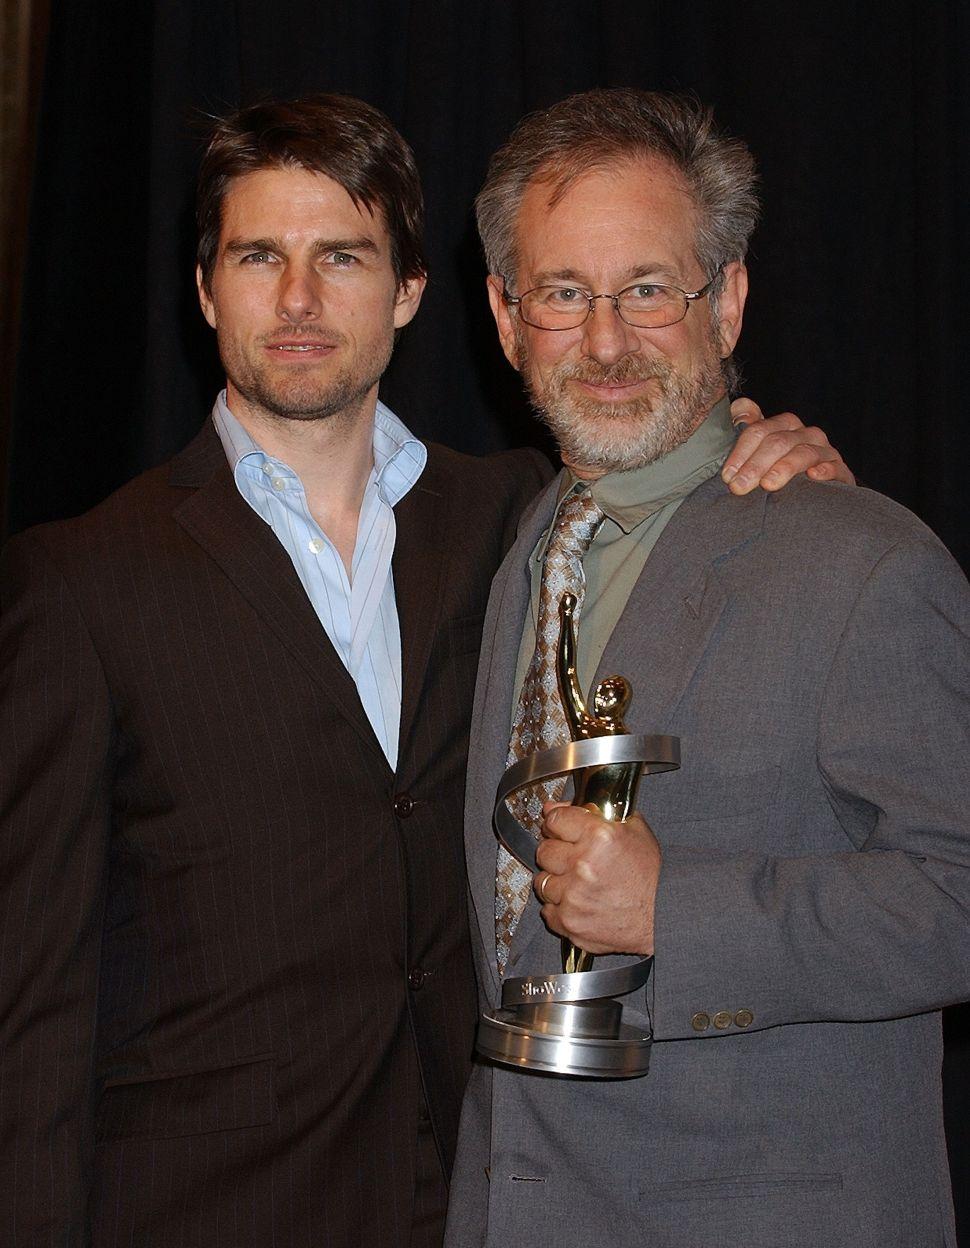 Rabbi Shmuley: When Scientology Tried to Recruit Steven Spielberg